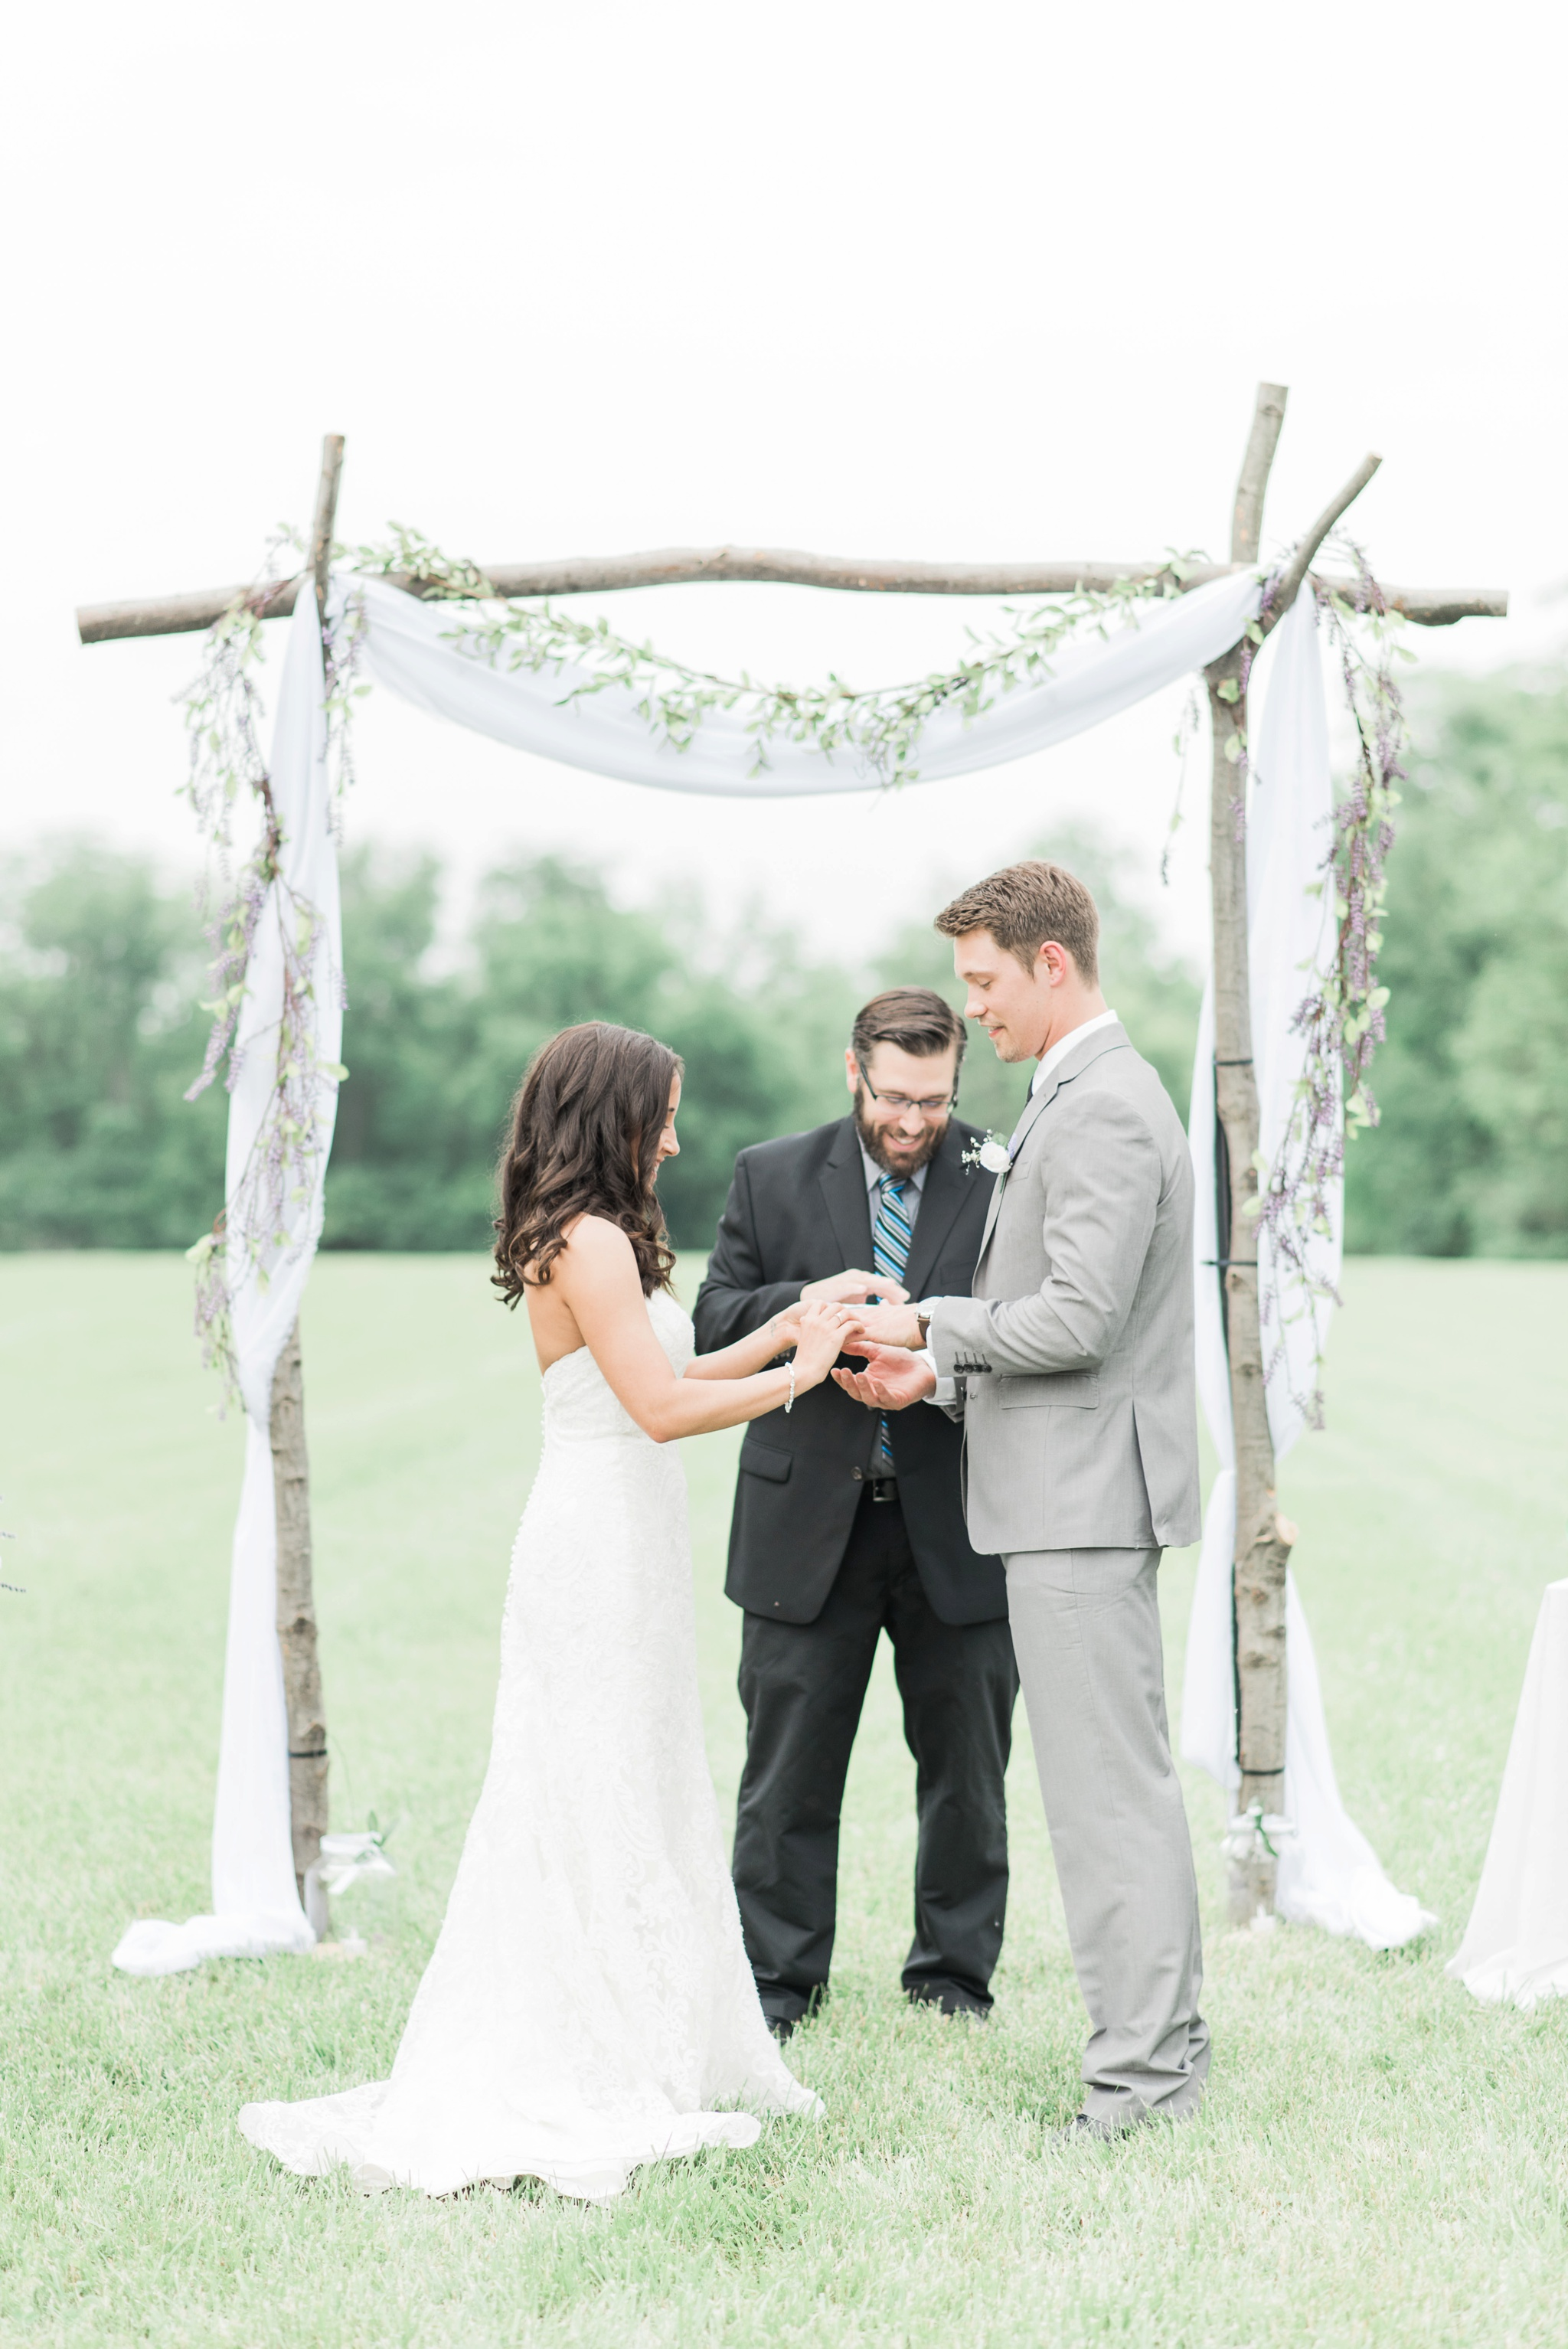 niederman-farm-wedding-cincinnati-ohio-photographer_0058.jpg